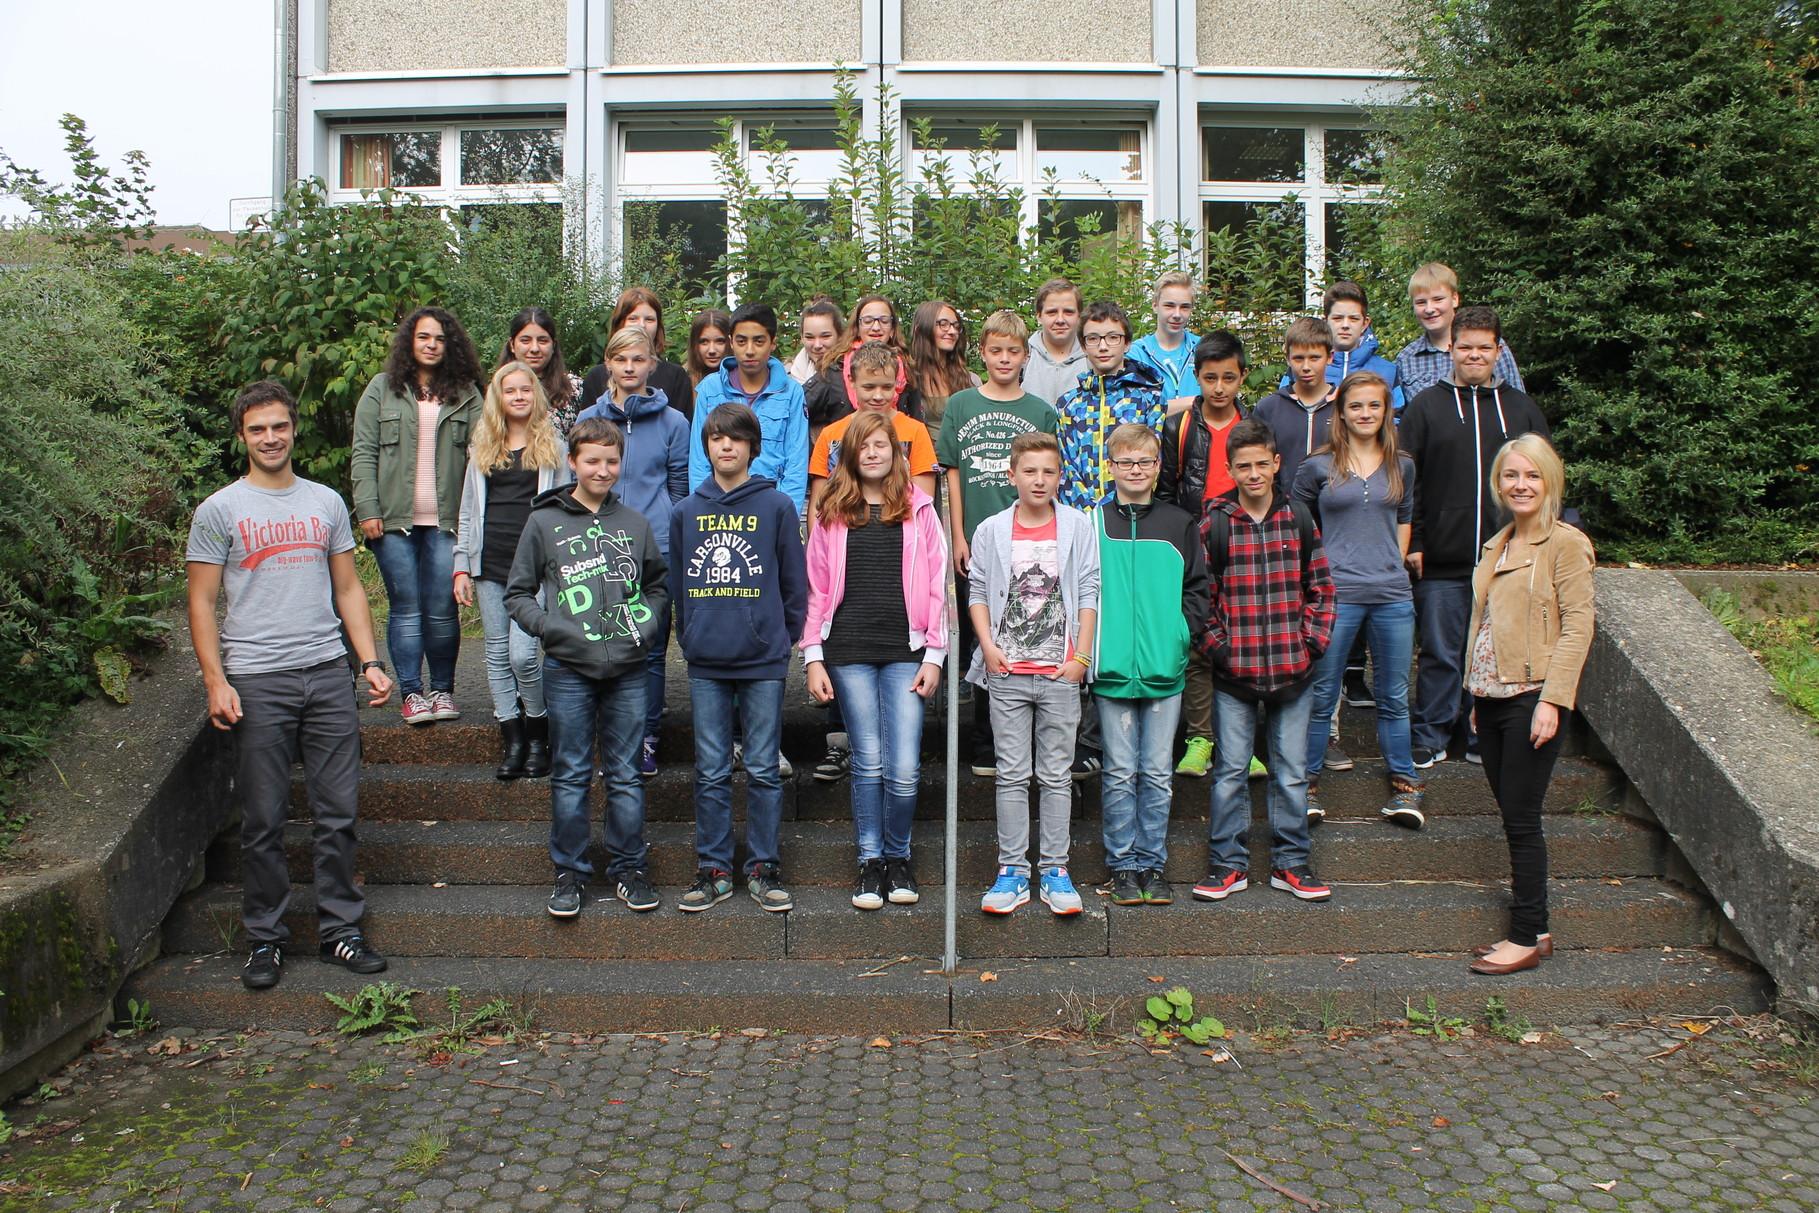 7b - Klassenlehrer: Frau Blefgen und Herr Reuter